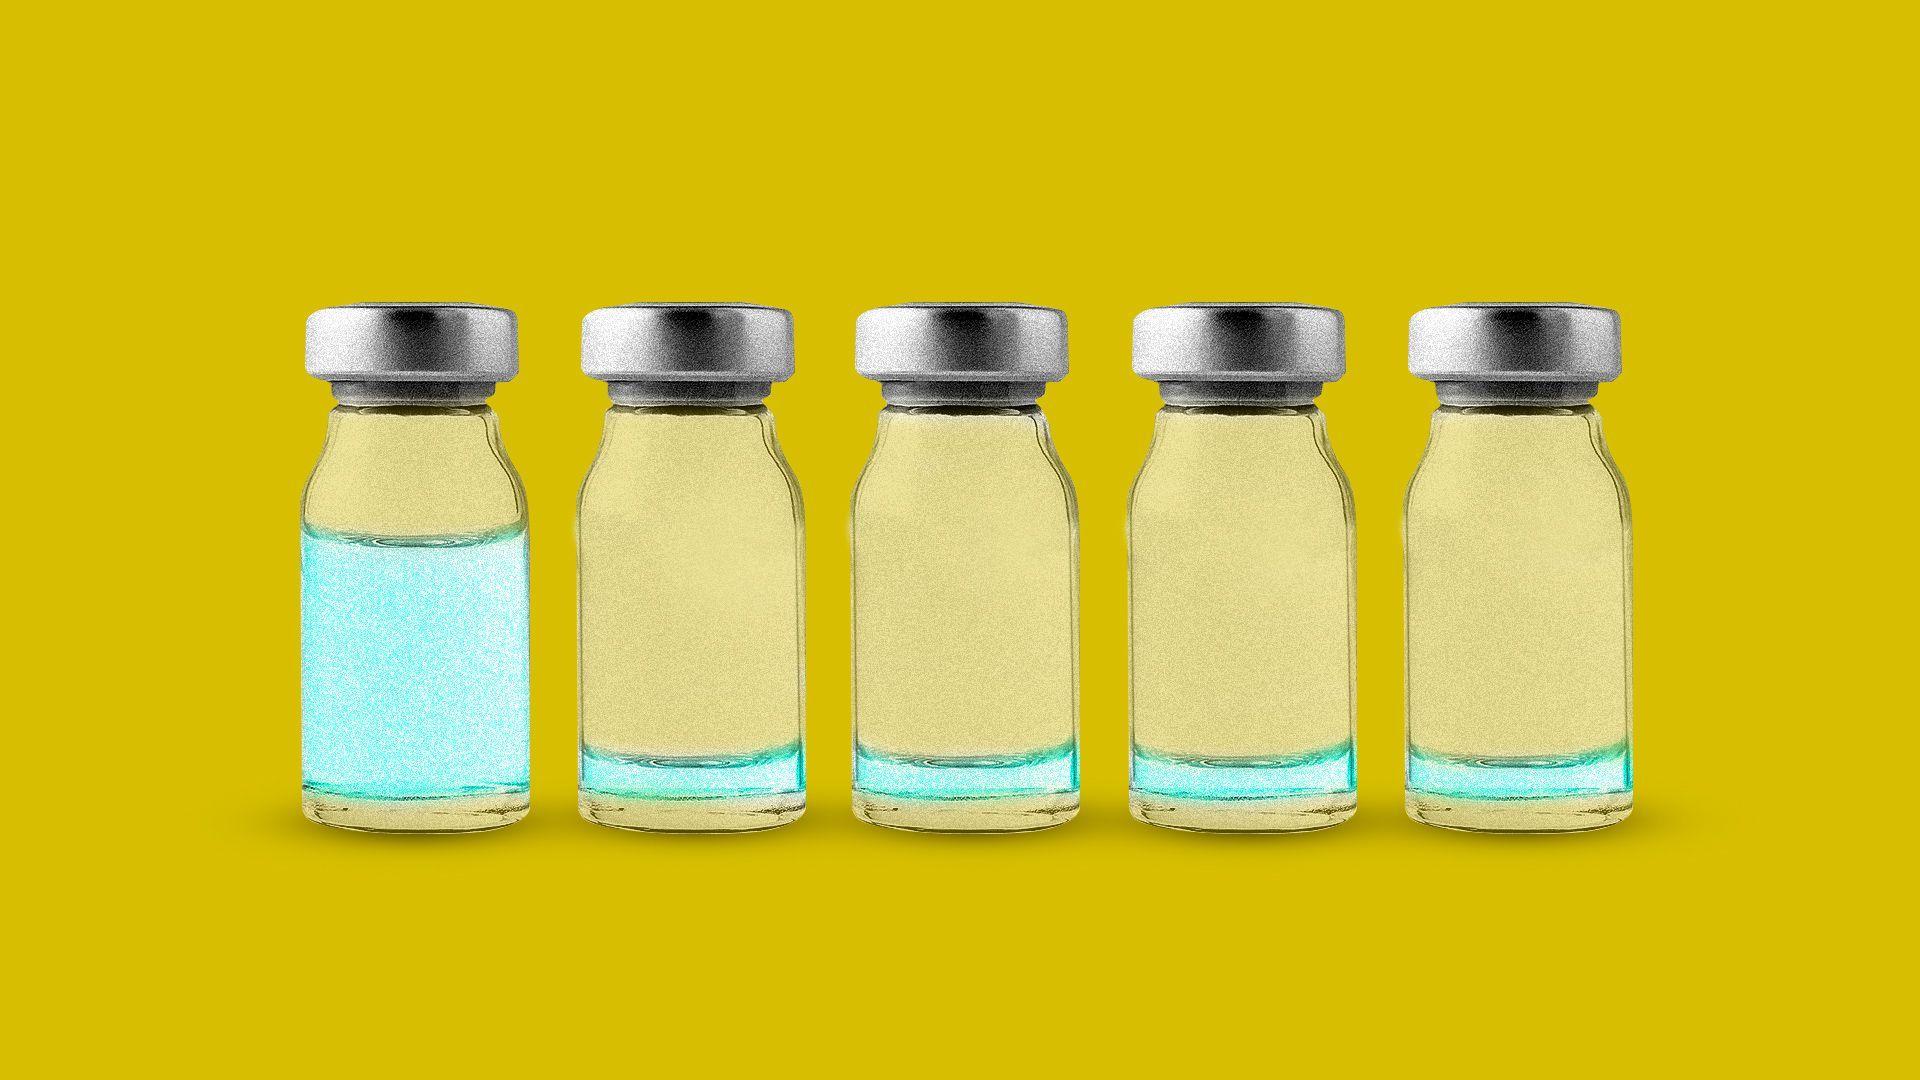 Illustration of 5 vaccine bottles, 4 are empty.